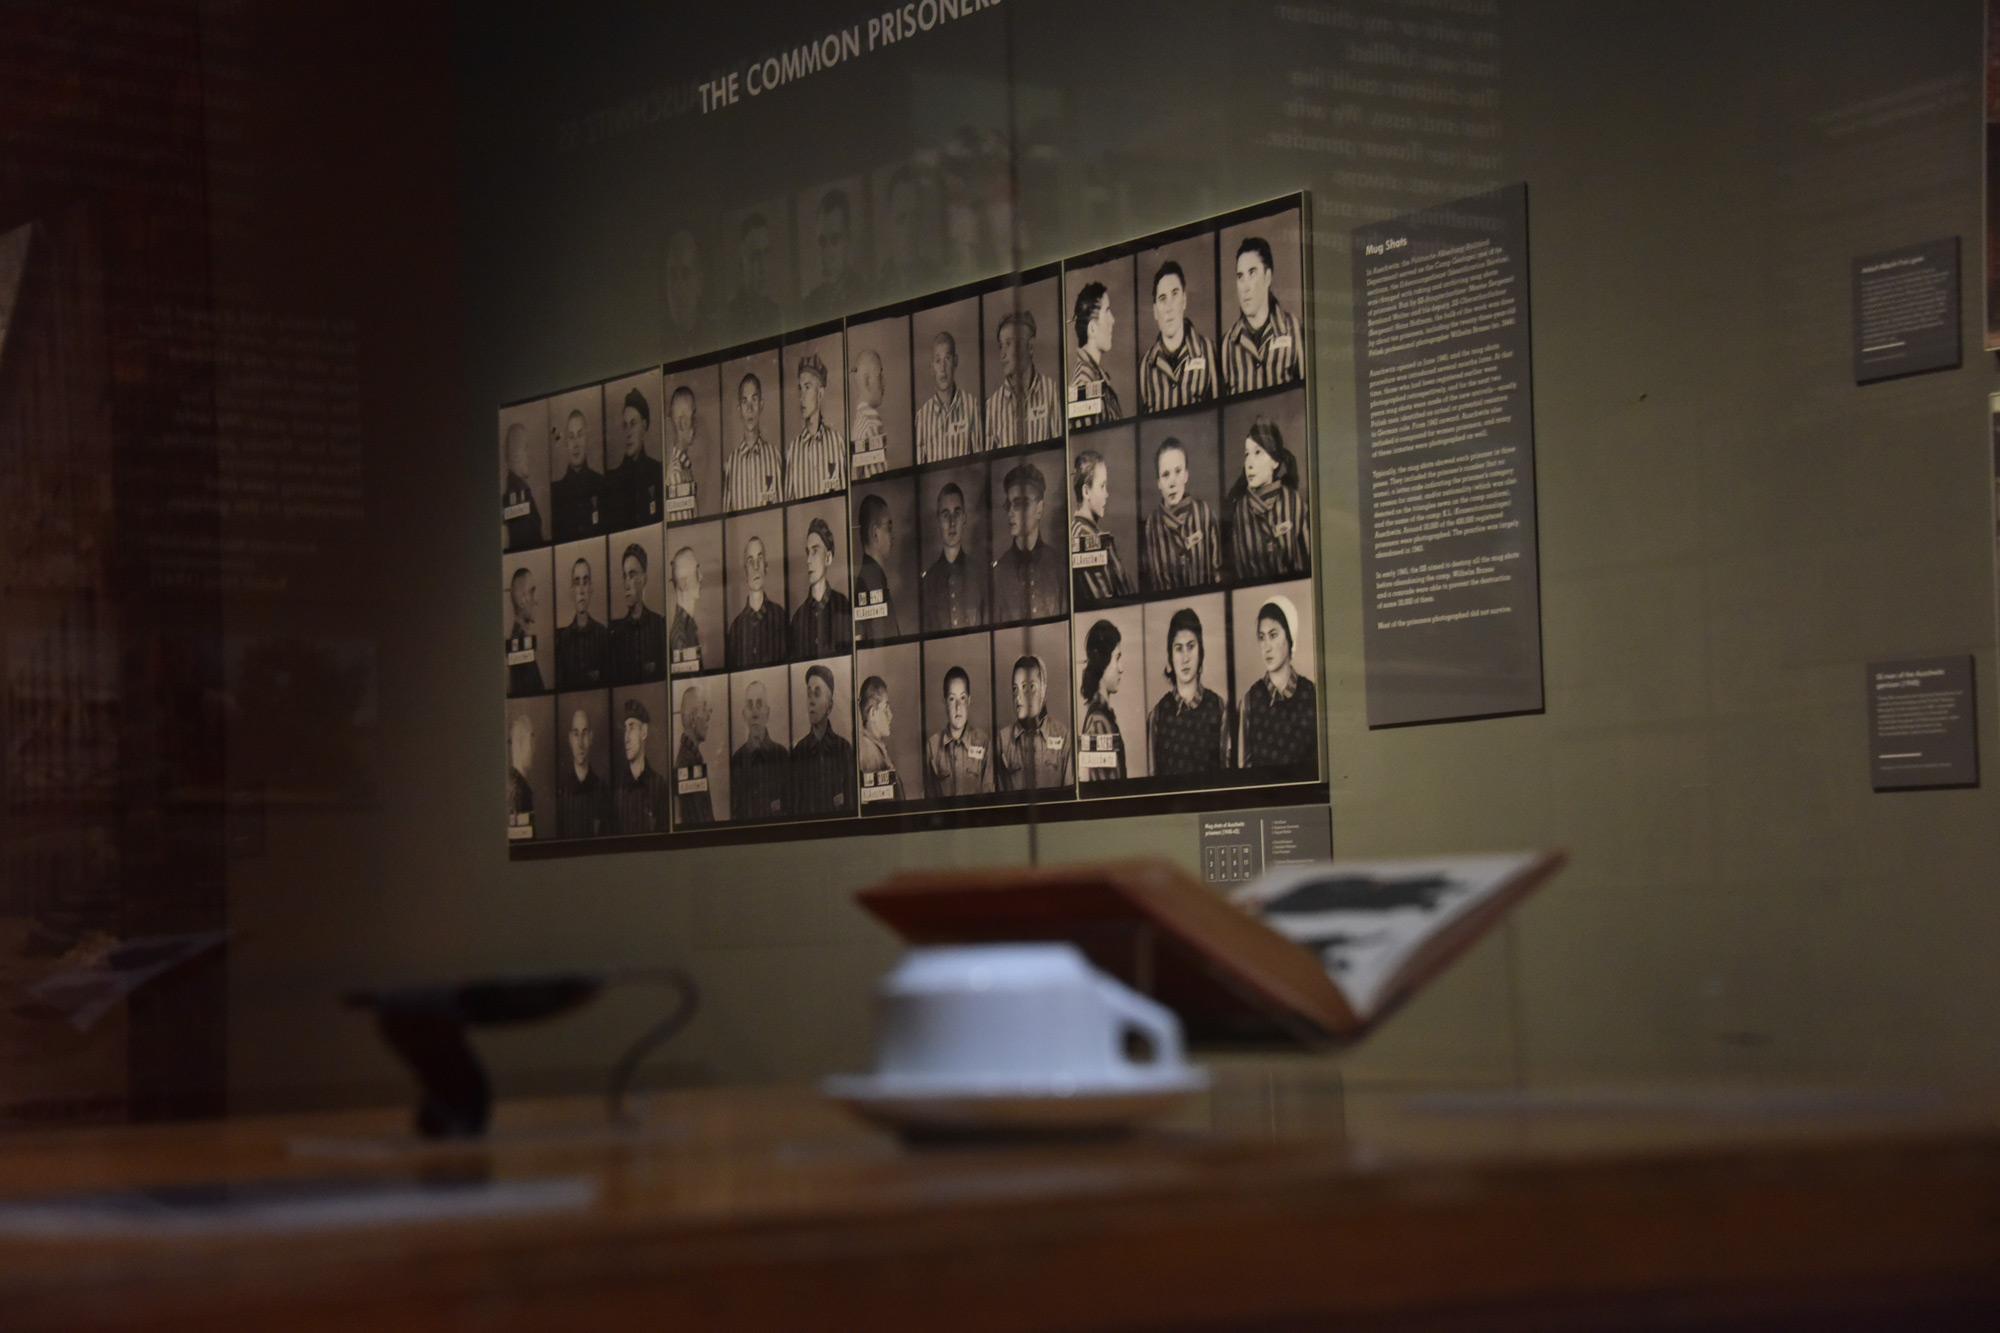 Photo by Pawel-Sawicki,-Auschwitz-Memorial of Exhibition Artifacts